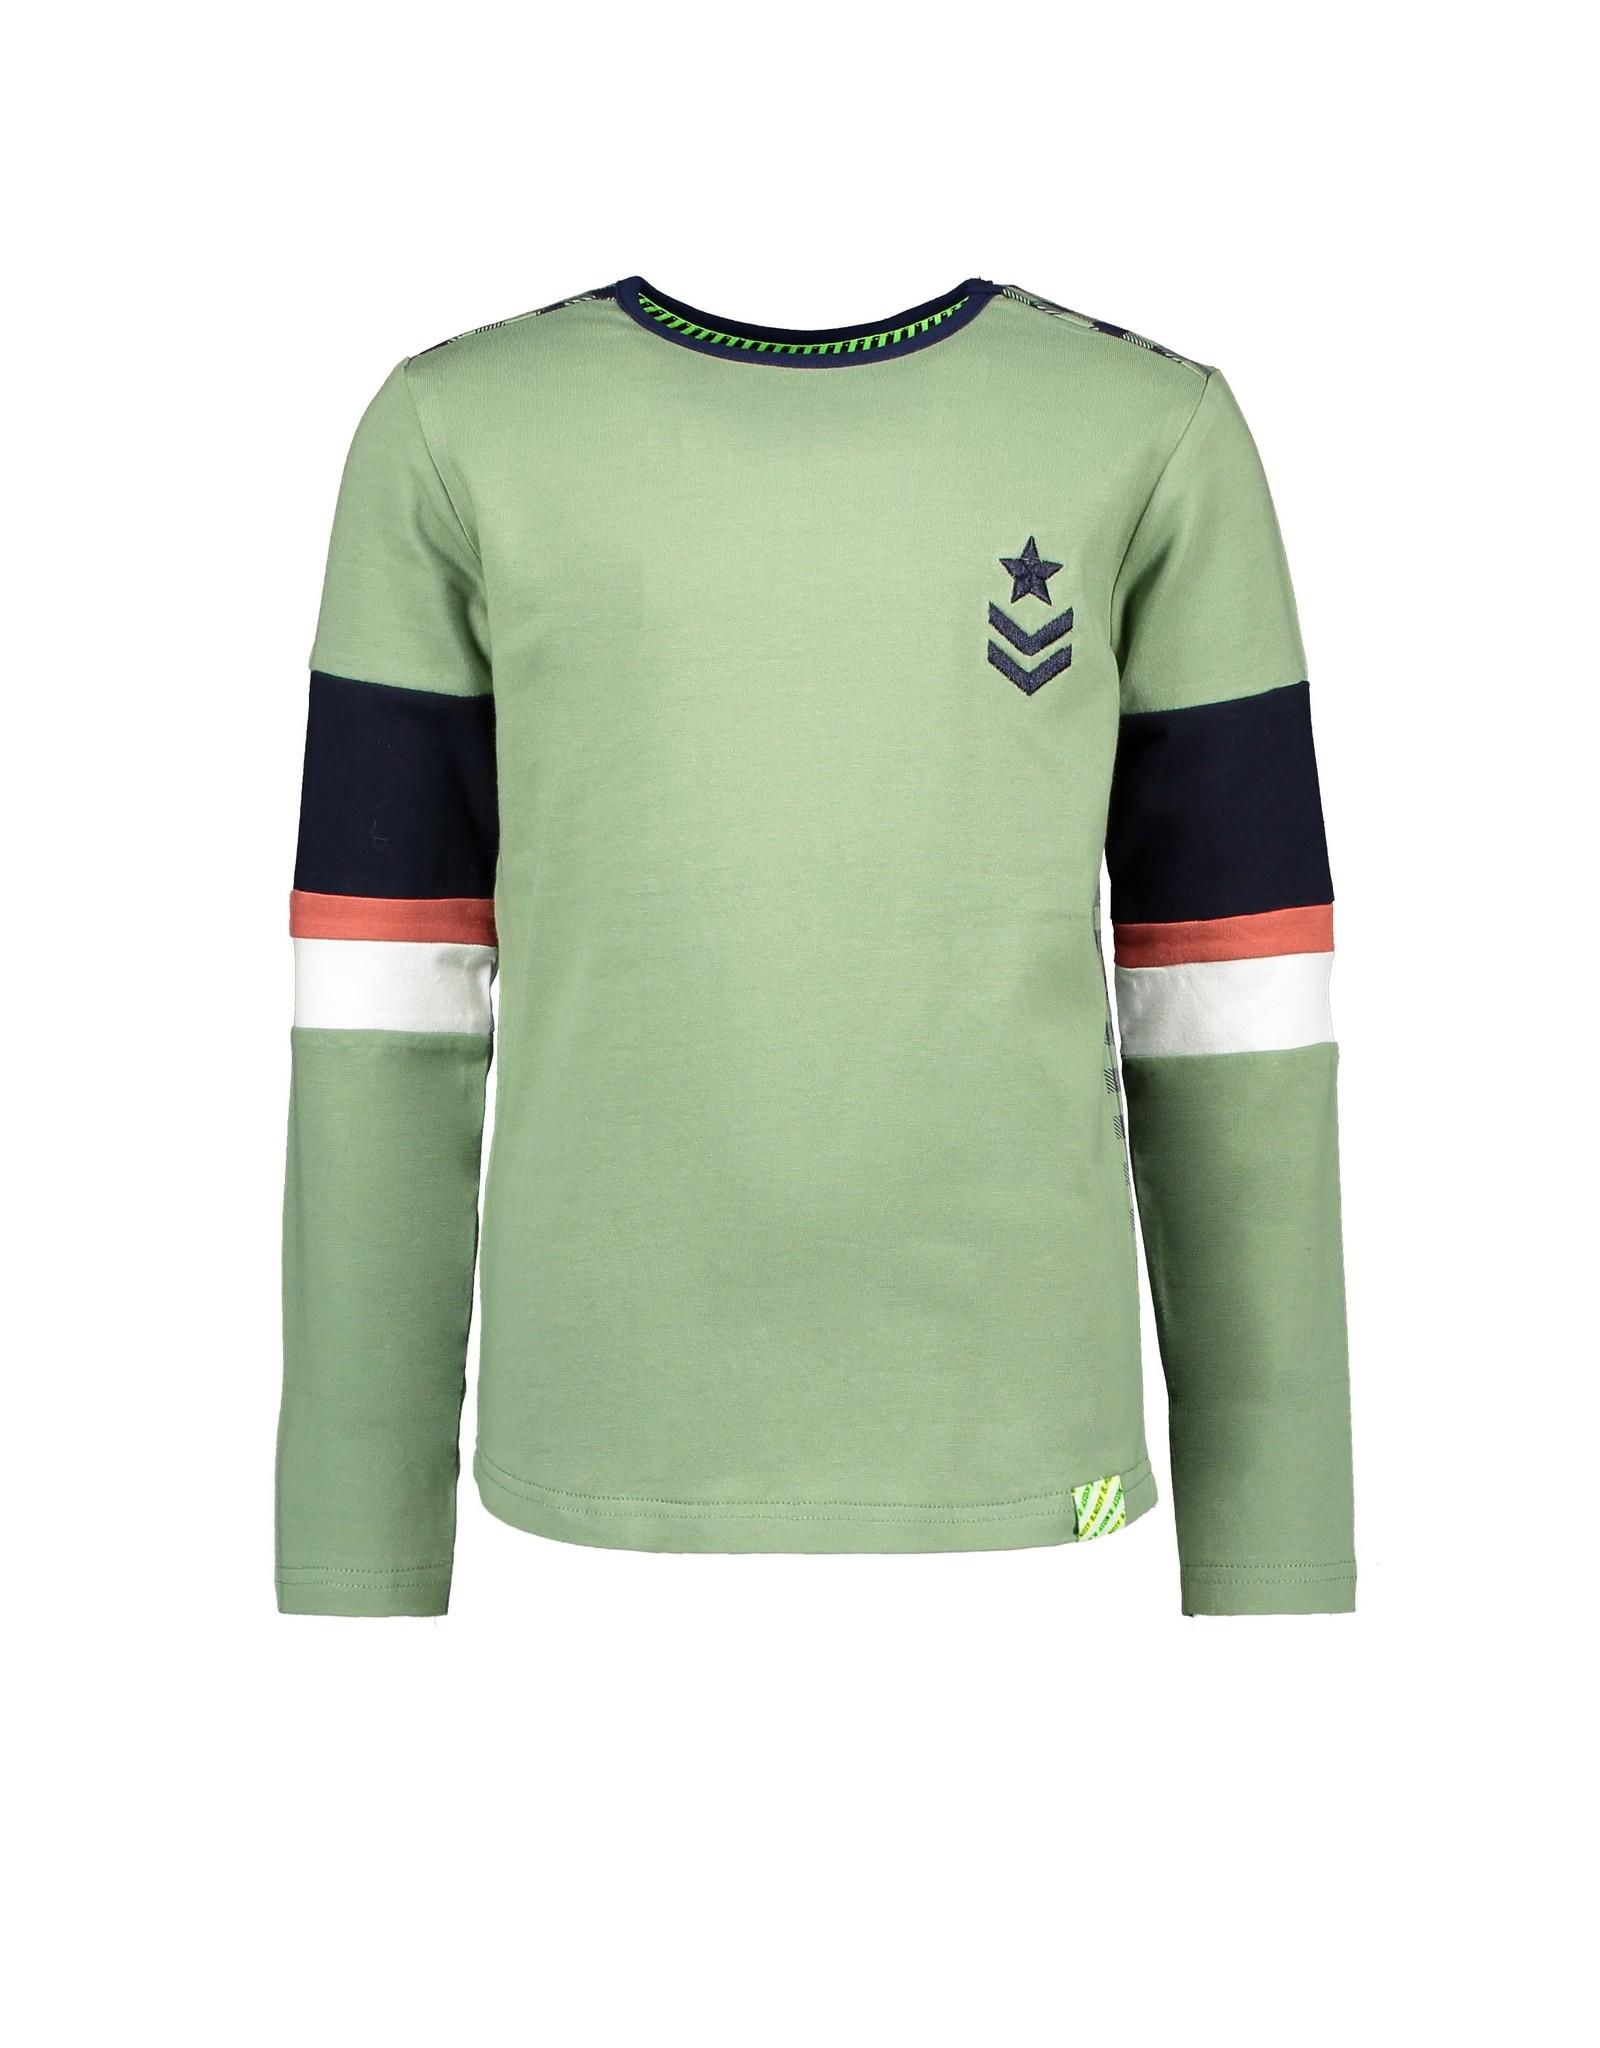 B.Nosy B. Nosy Boys Shirt With Contrast Check Backside Hunter Green